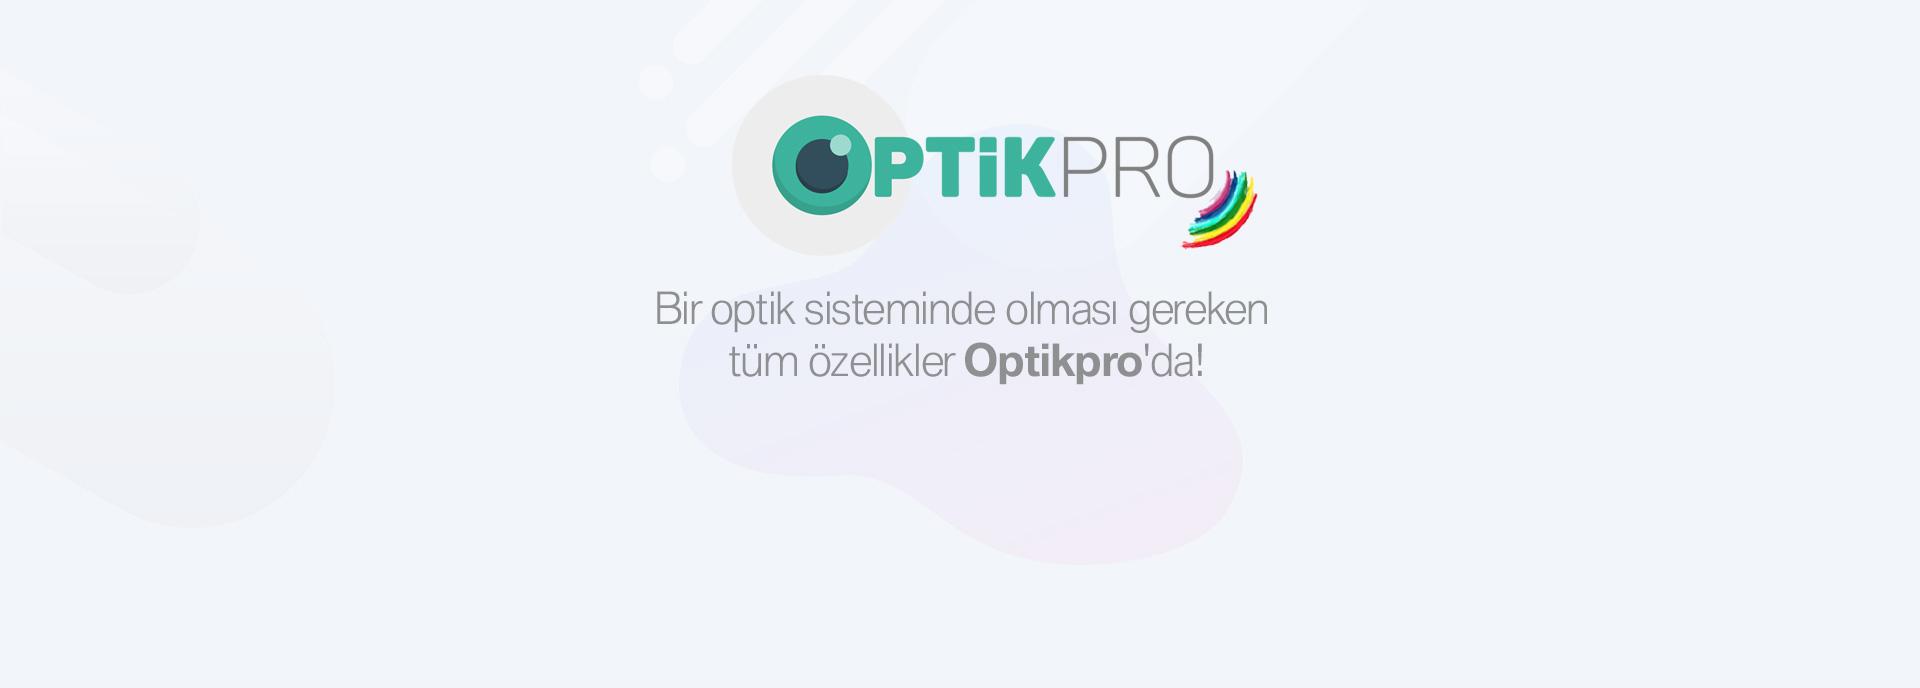 OptikPro Nedir? / Kısaca Optik Pro